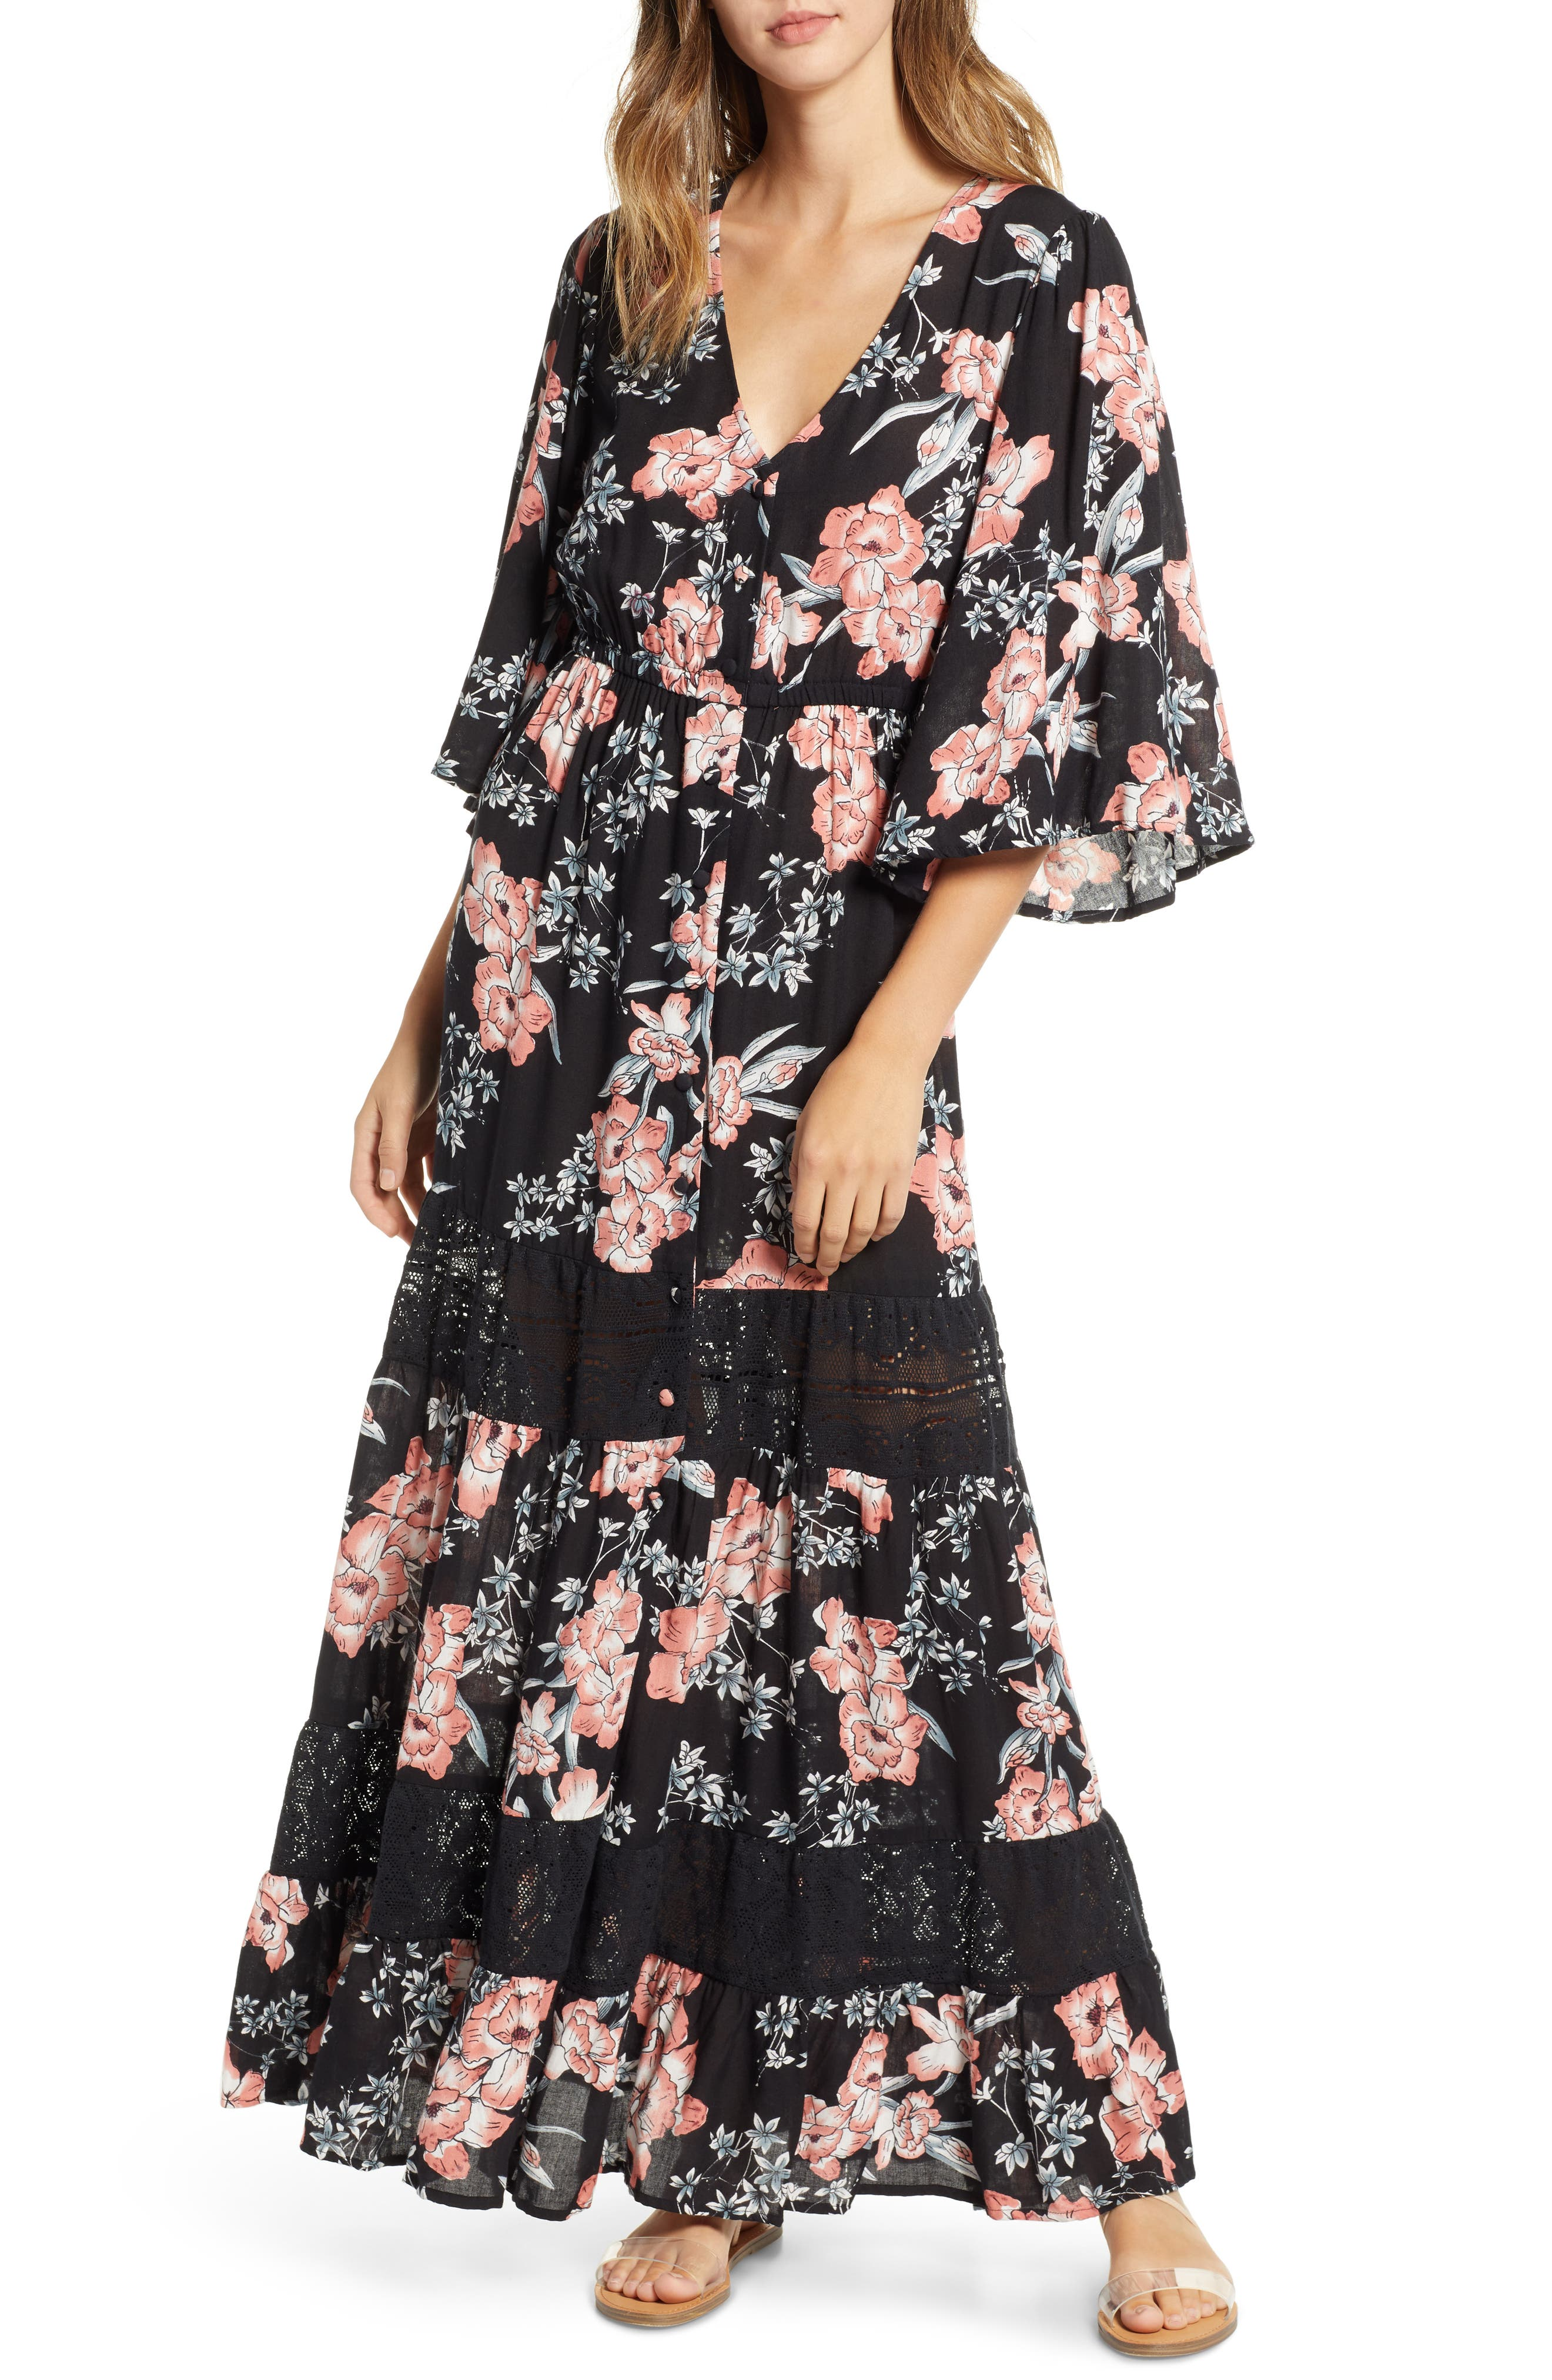 Rip Curl Nalu Lace Inset Maxi Dress, Black